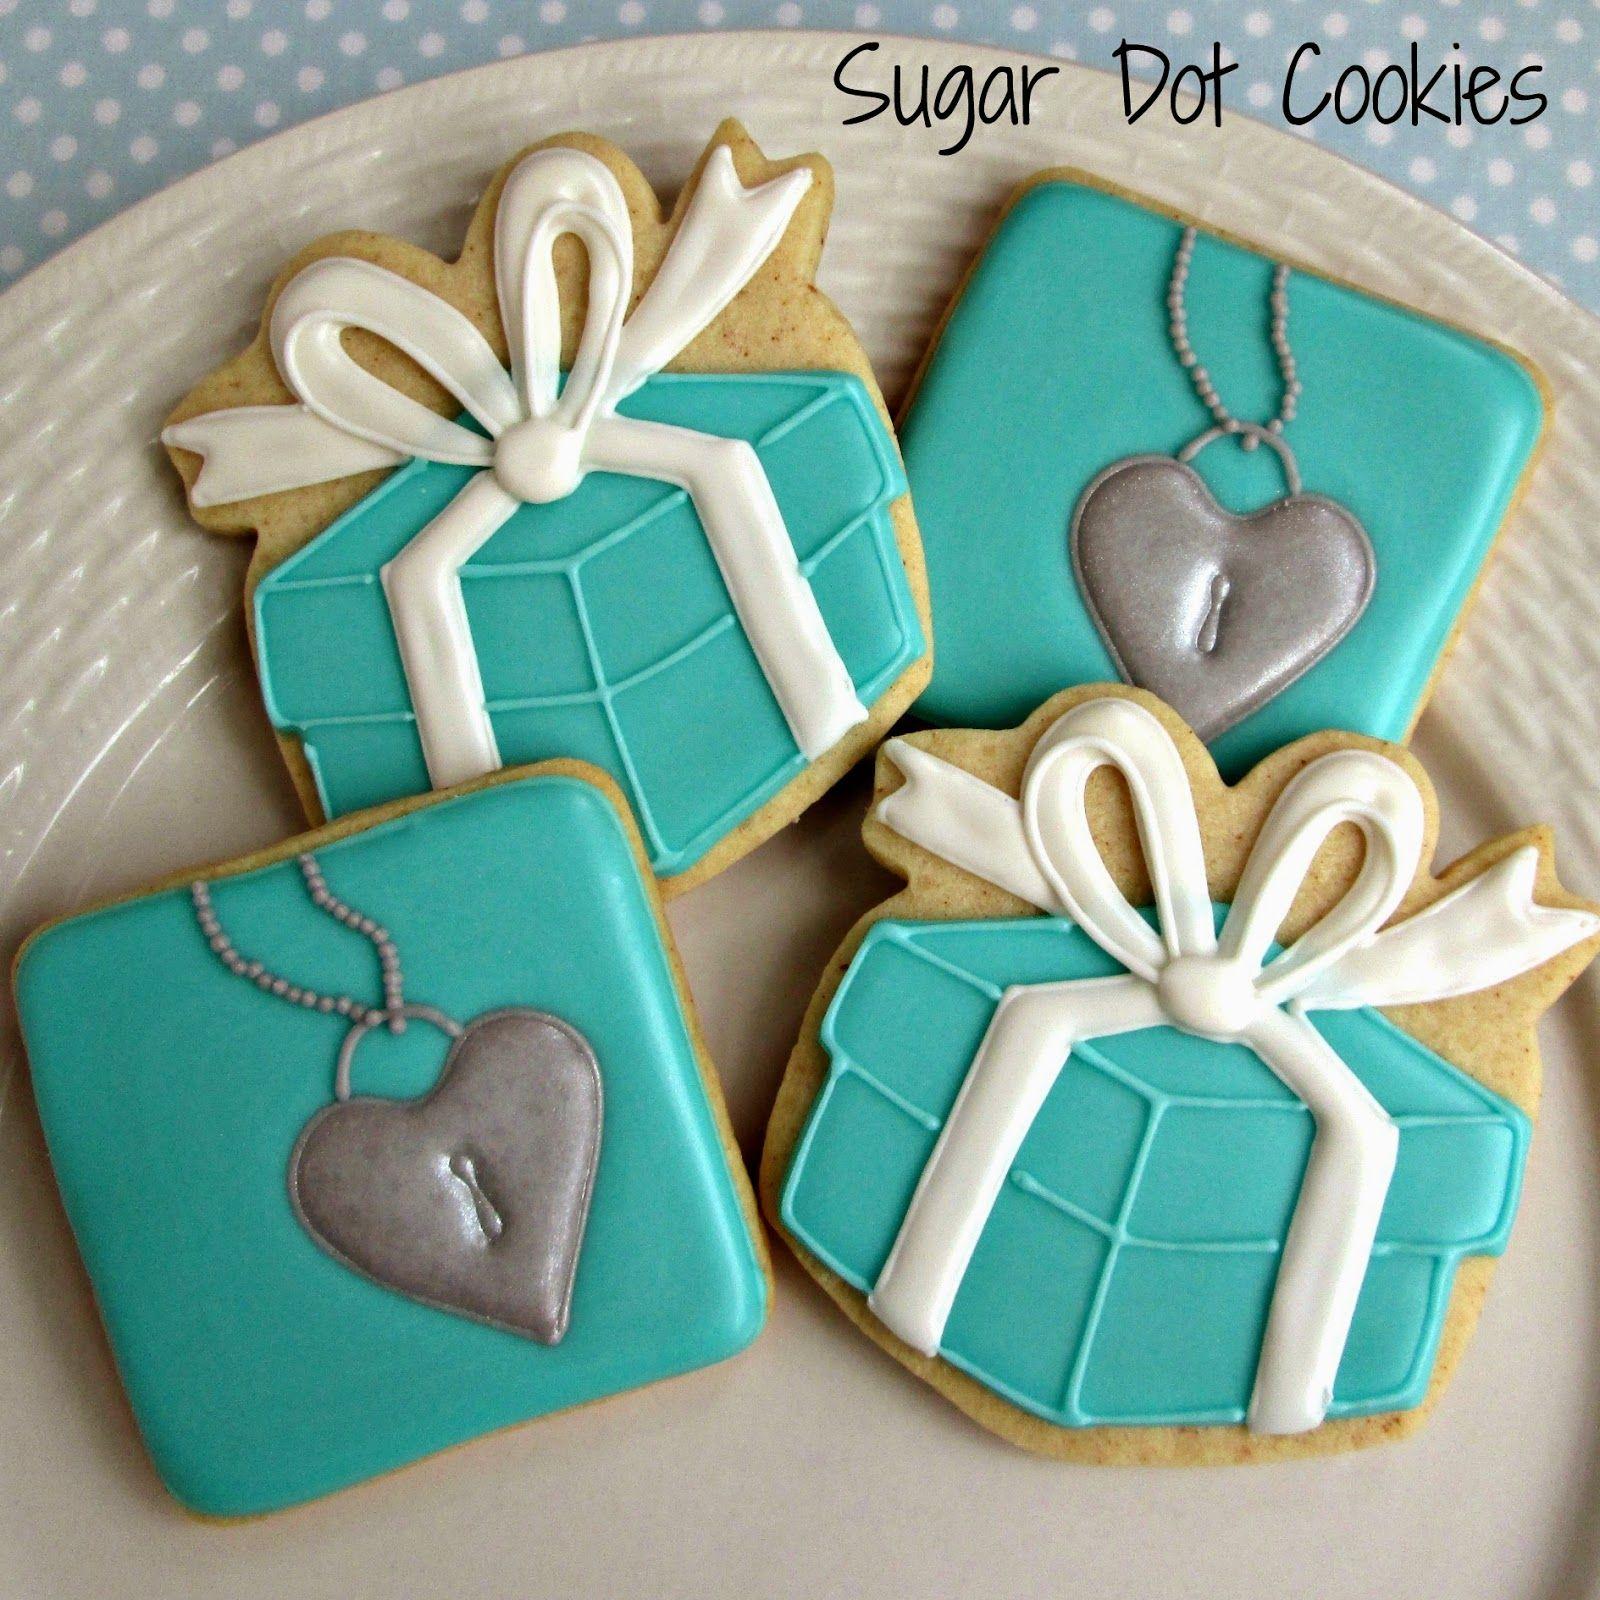 Jewelry Sugar Cookies The Heart Lockets Were Transfers